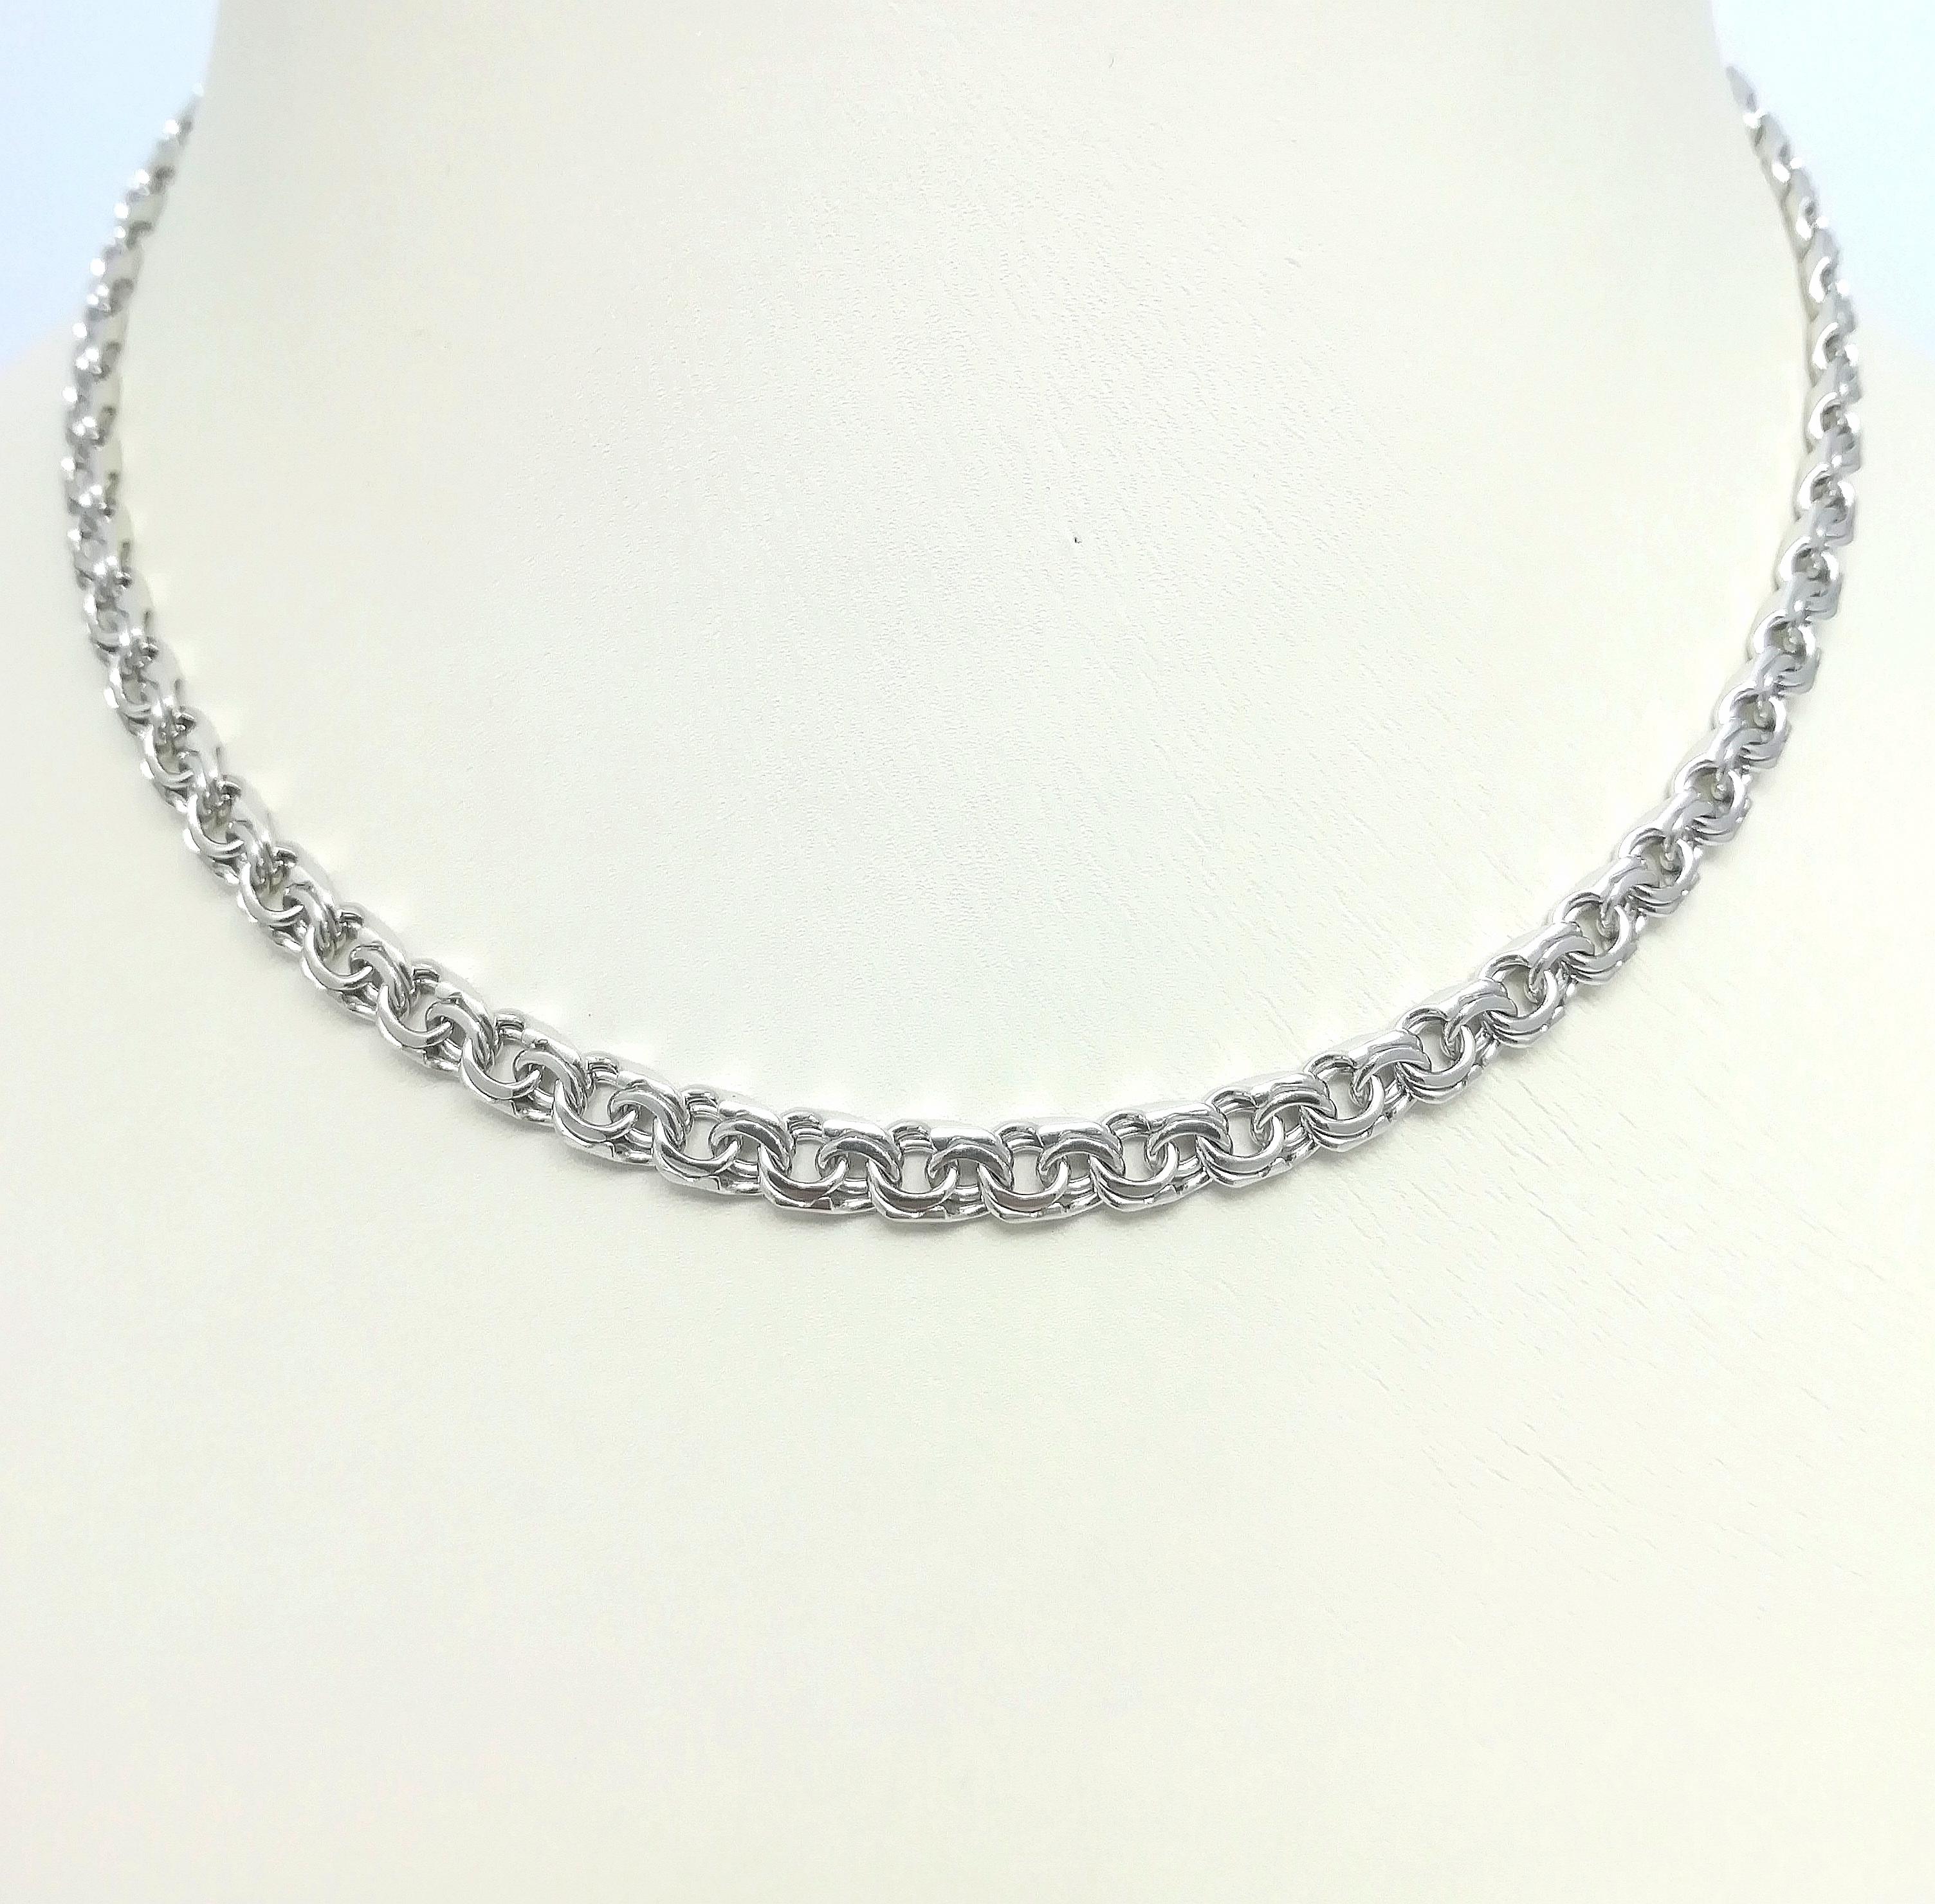 Серебро цепь дк240920-118 23,70гр